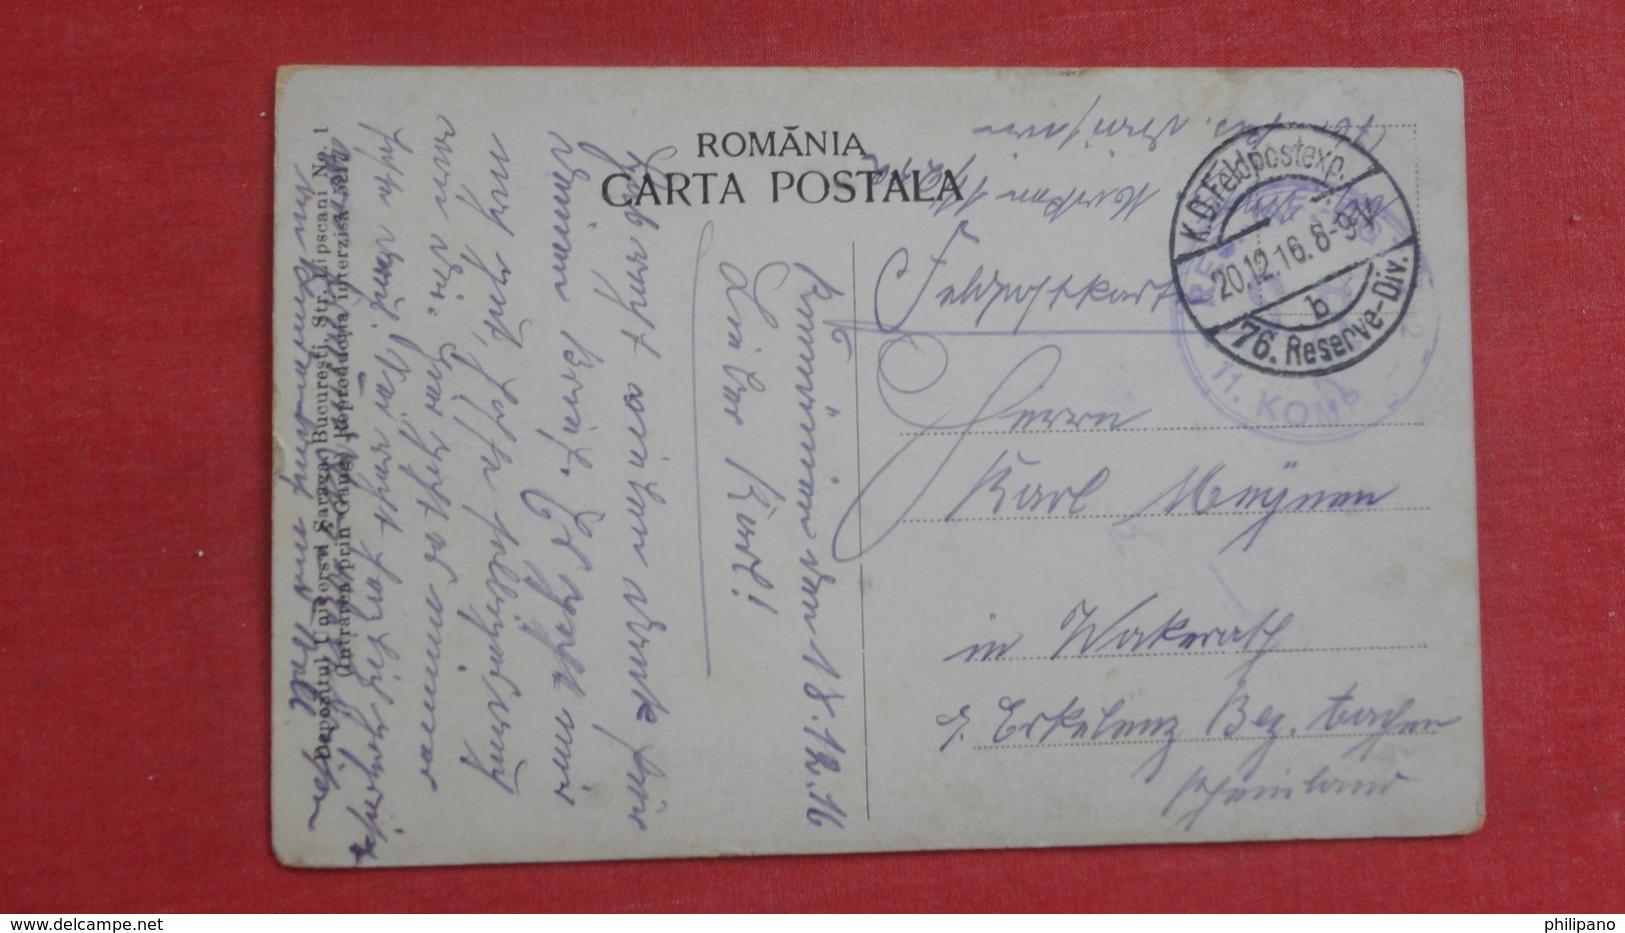 Romania Campina Eruptia Sondei No. 12 -ref-2612 - Rumänien